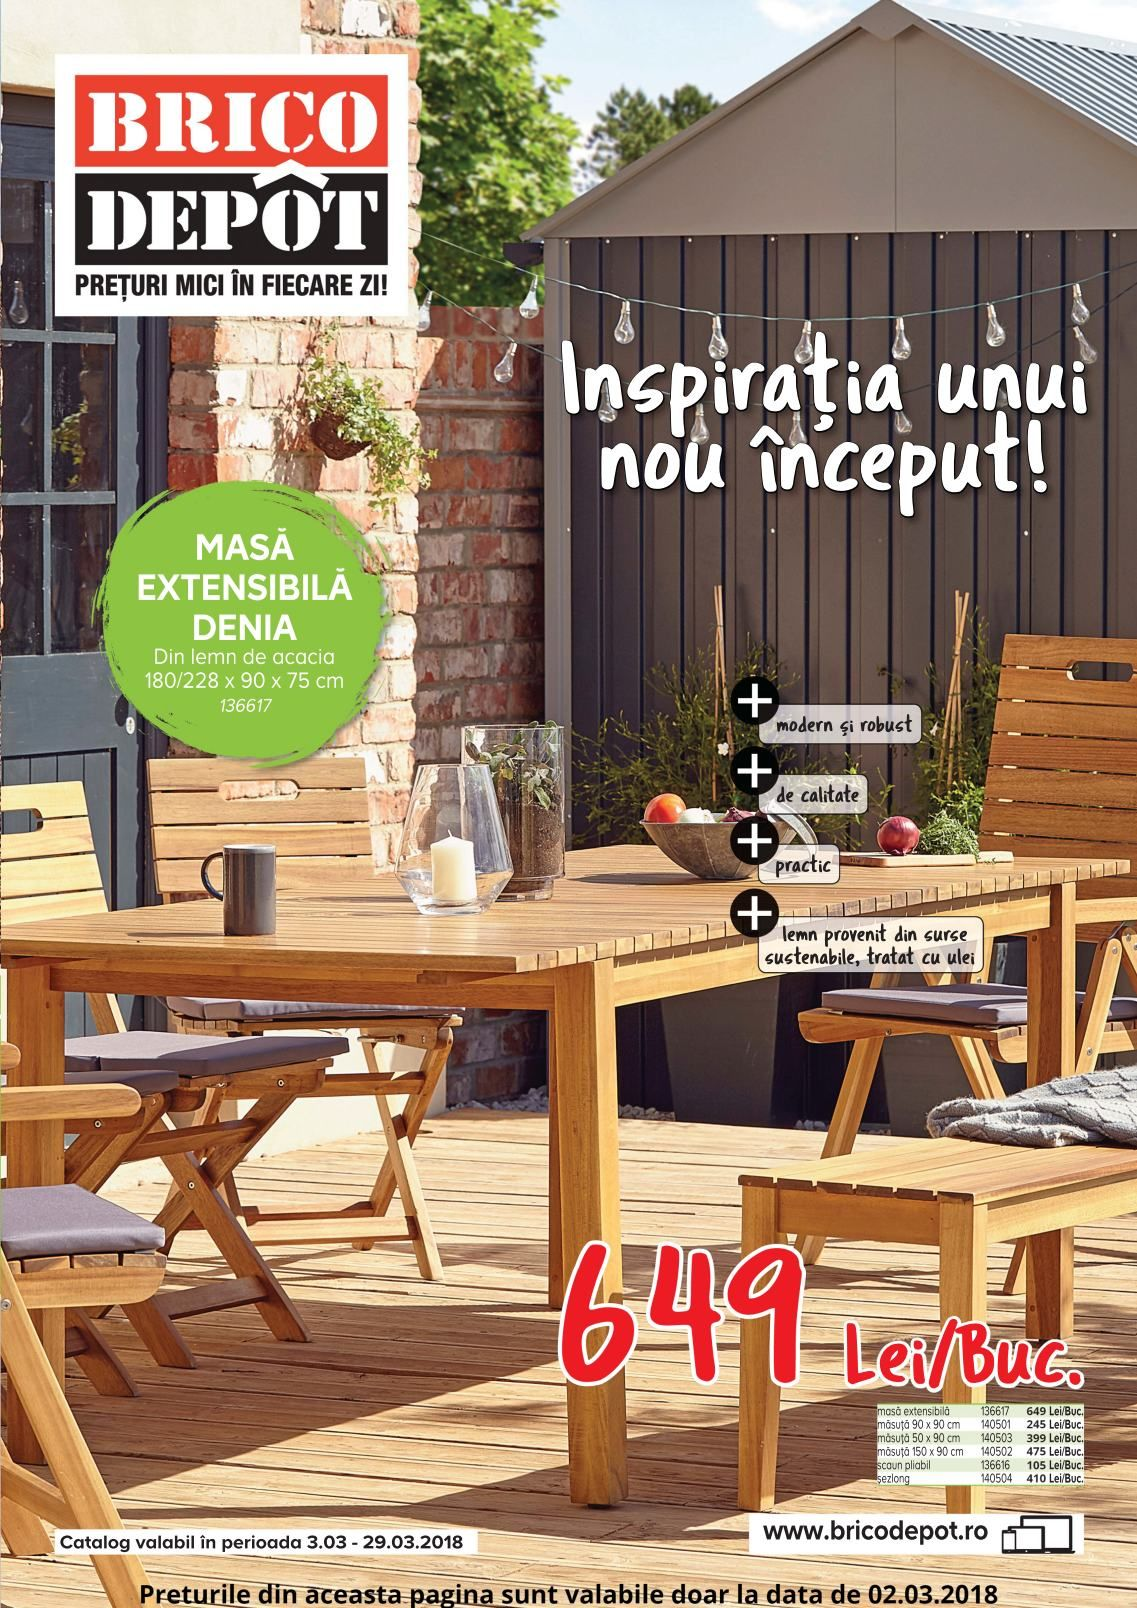 Catalog Brico Depot Inspiratia Unui Nou Inceput 03 29 Martie 2018 Outdoor Furniture Sets Outdoor Furniture Outdoor Decor